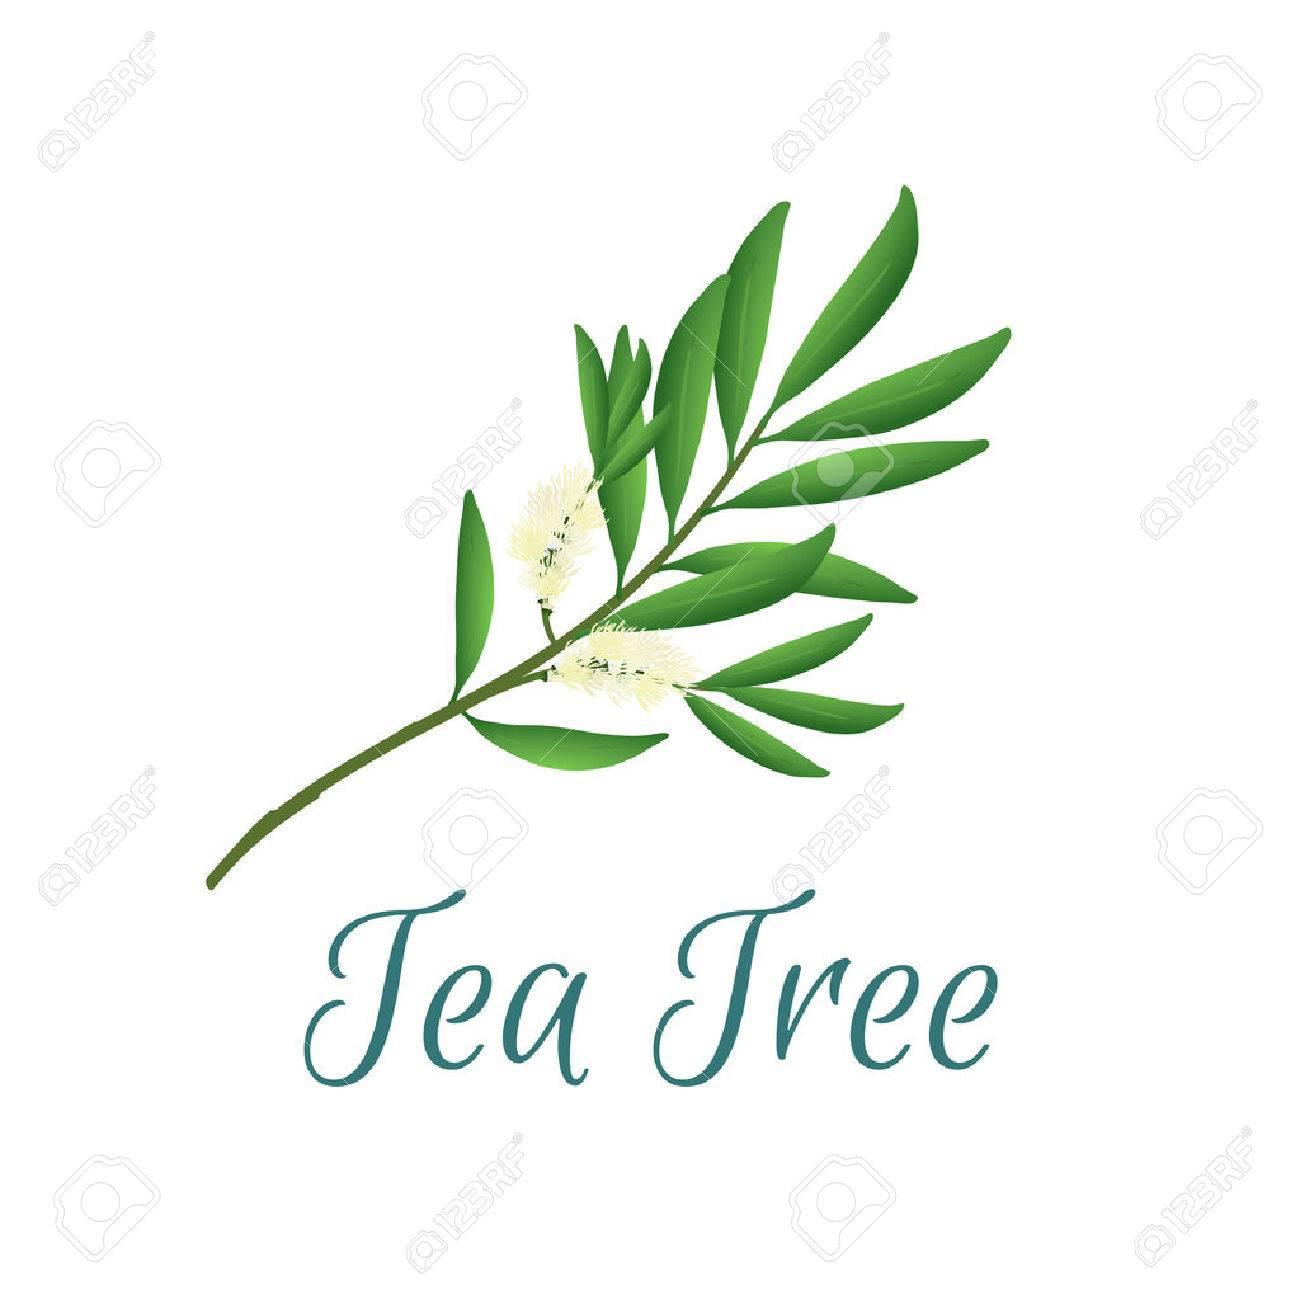 illustration with tea tree, also named like Malaleuca alternifolia, used in aromatherapy and medicine - 65473899